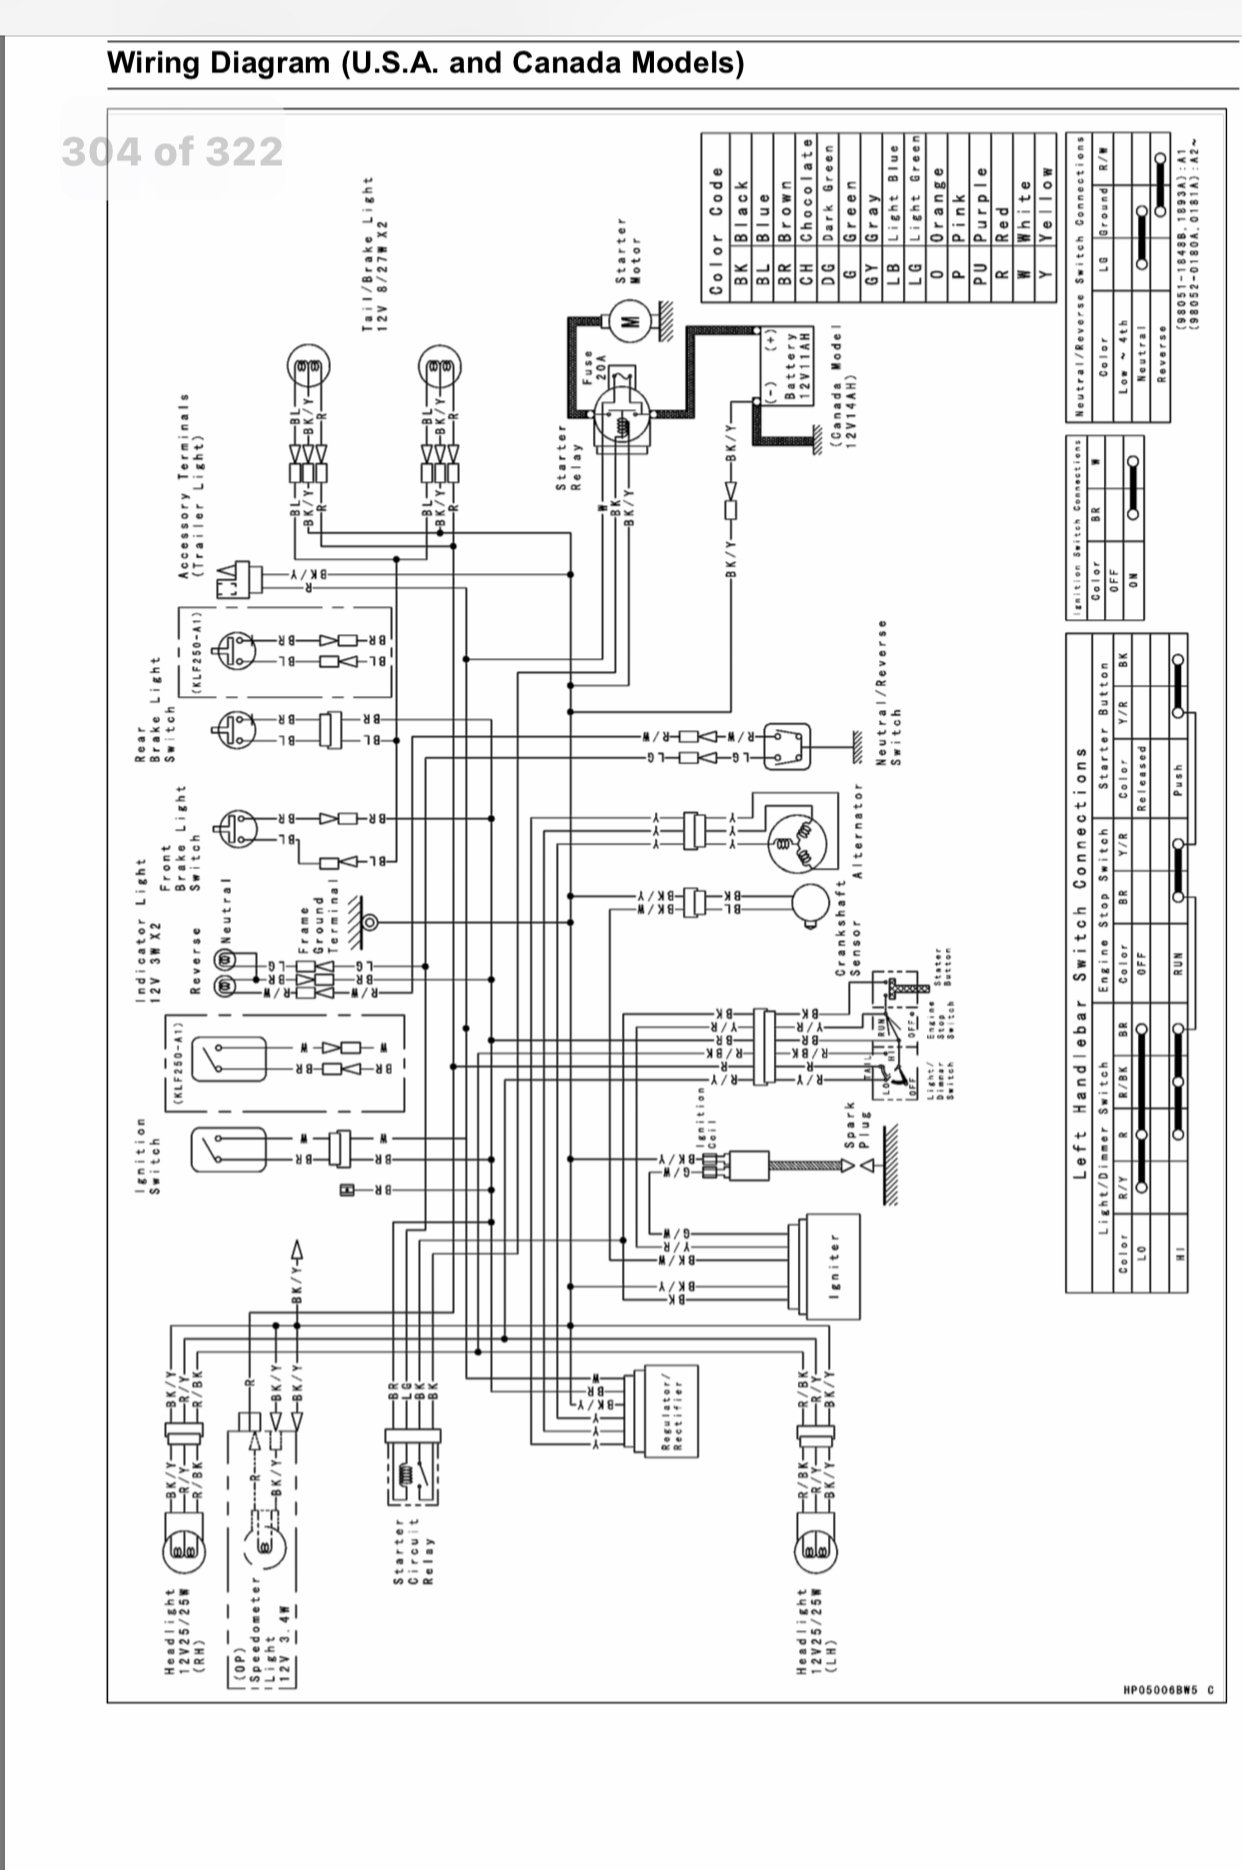 Diagram Kawasaki 220 Atv Wiring Diagram Full Version Hd Quality Wiring Diagram Diagramband Umncv It